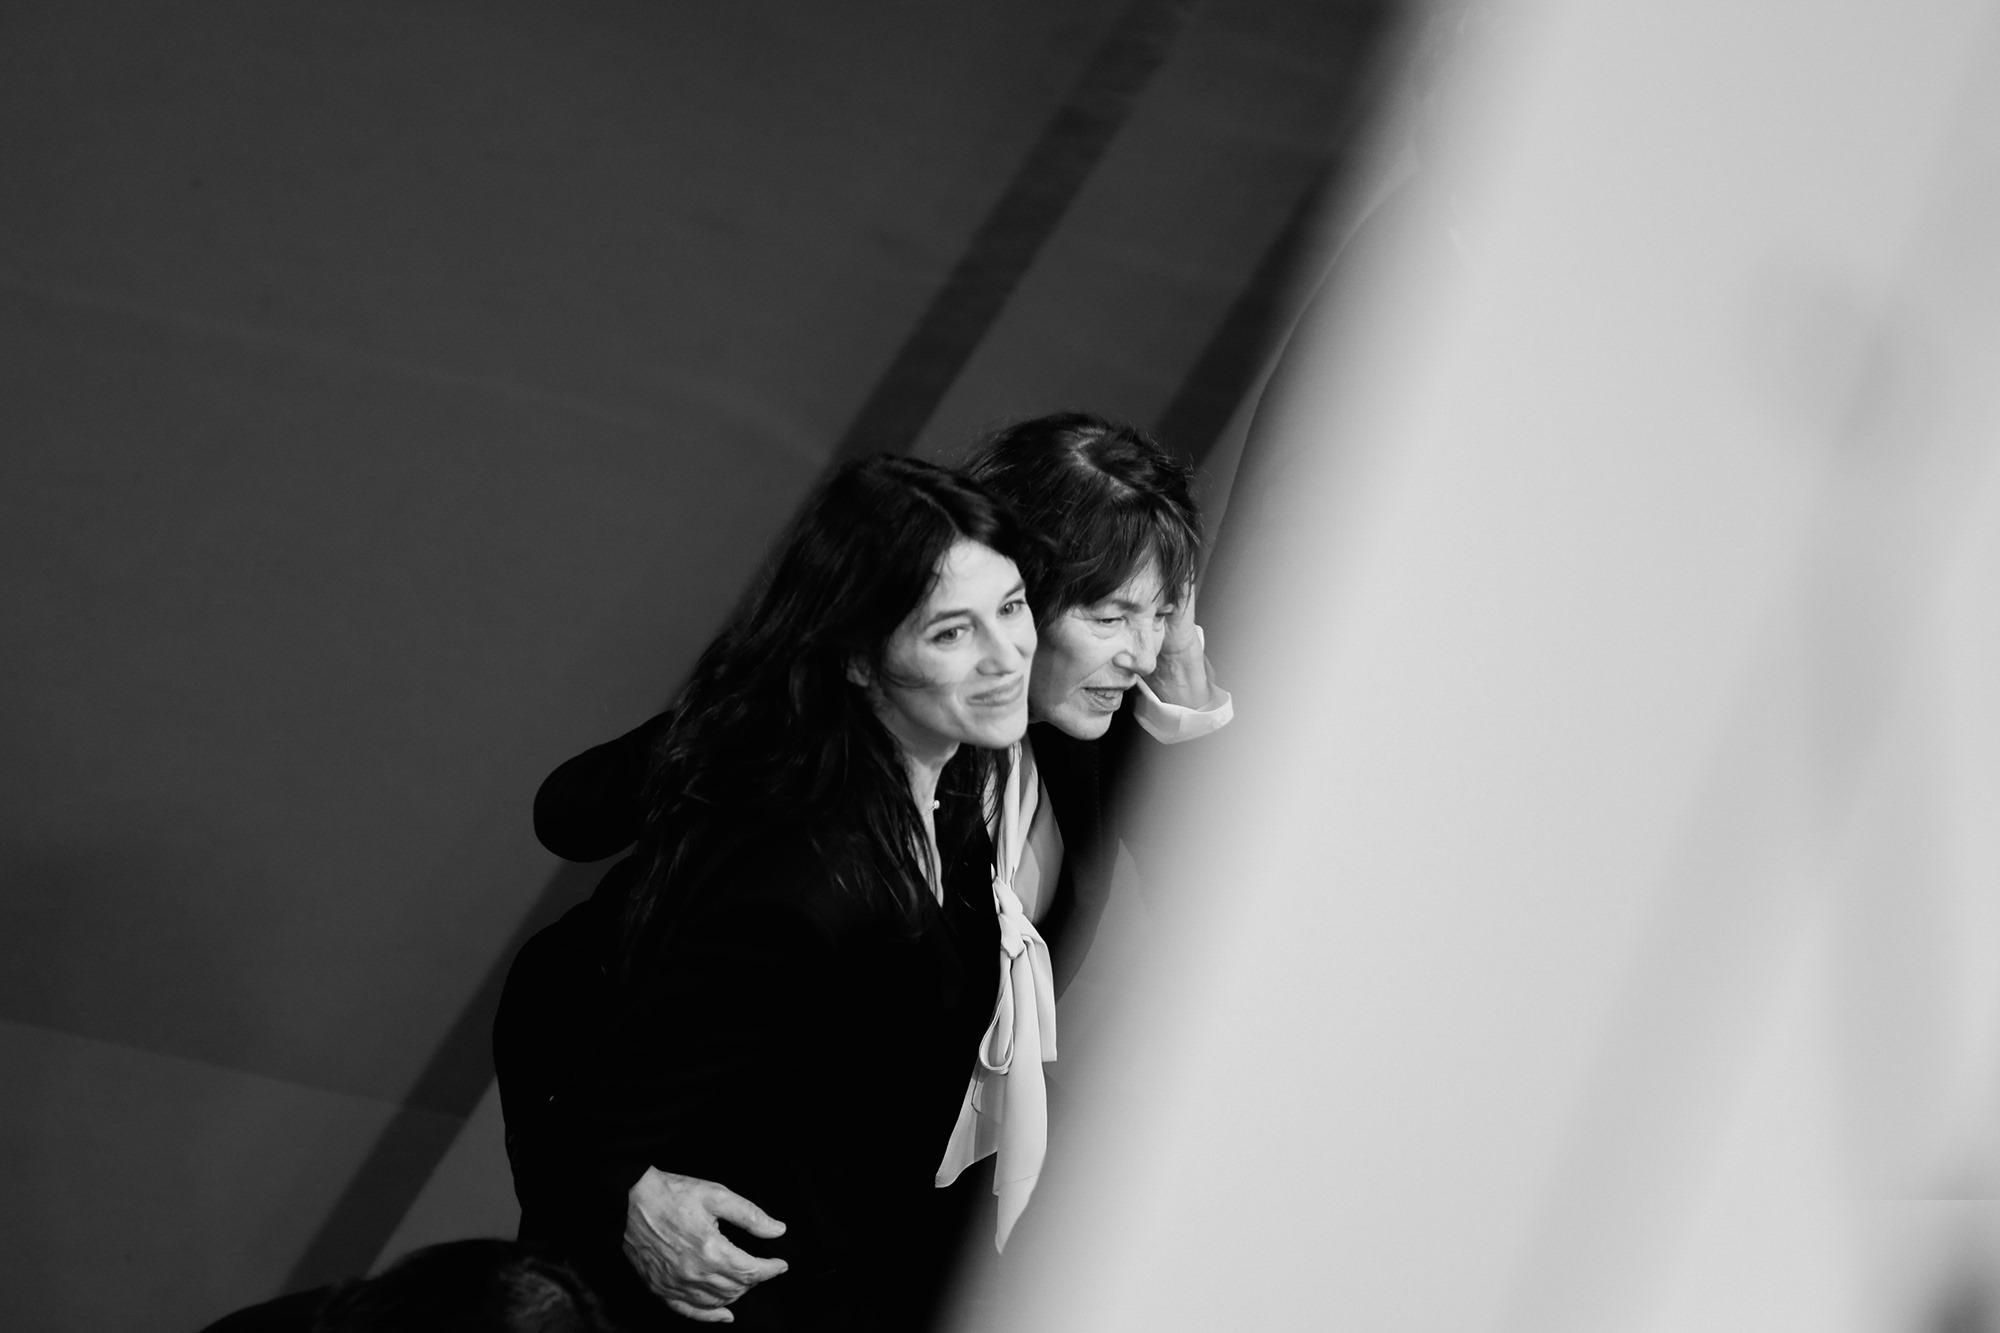 Cannes black n white 3